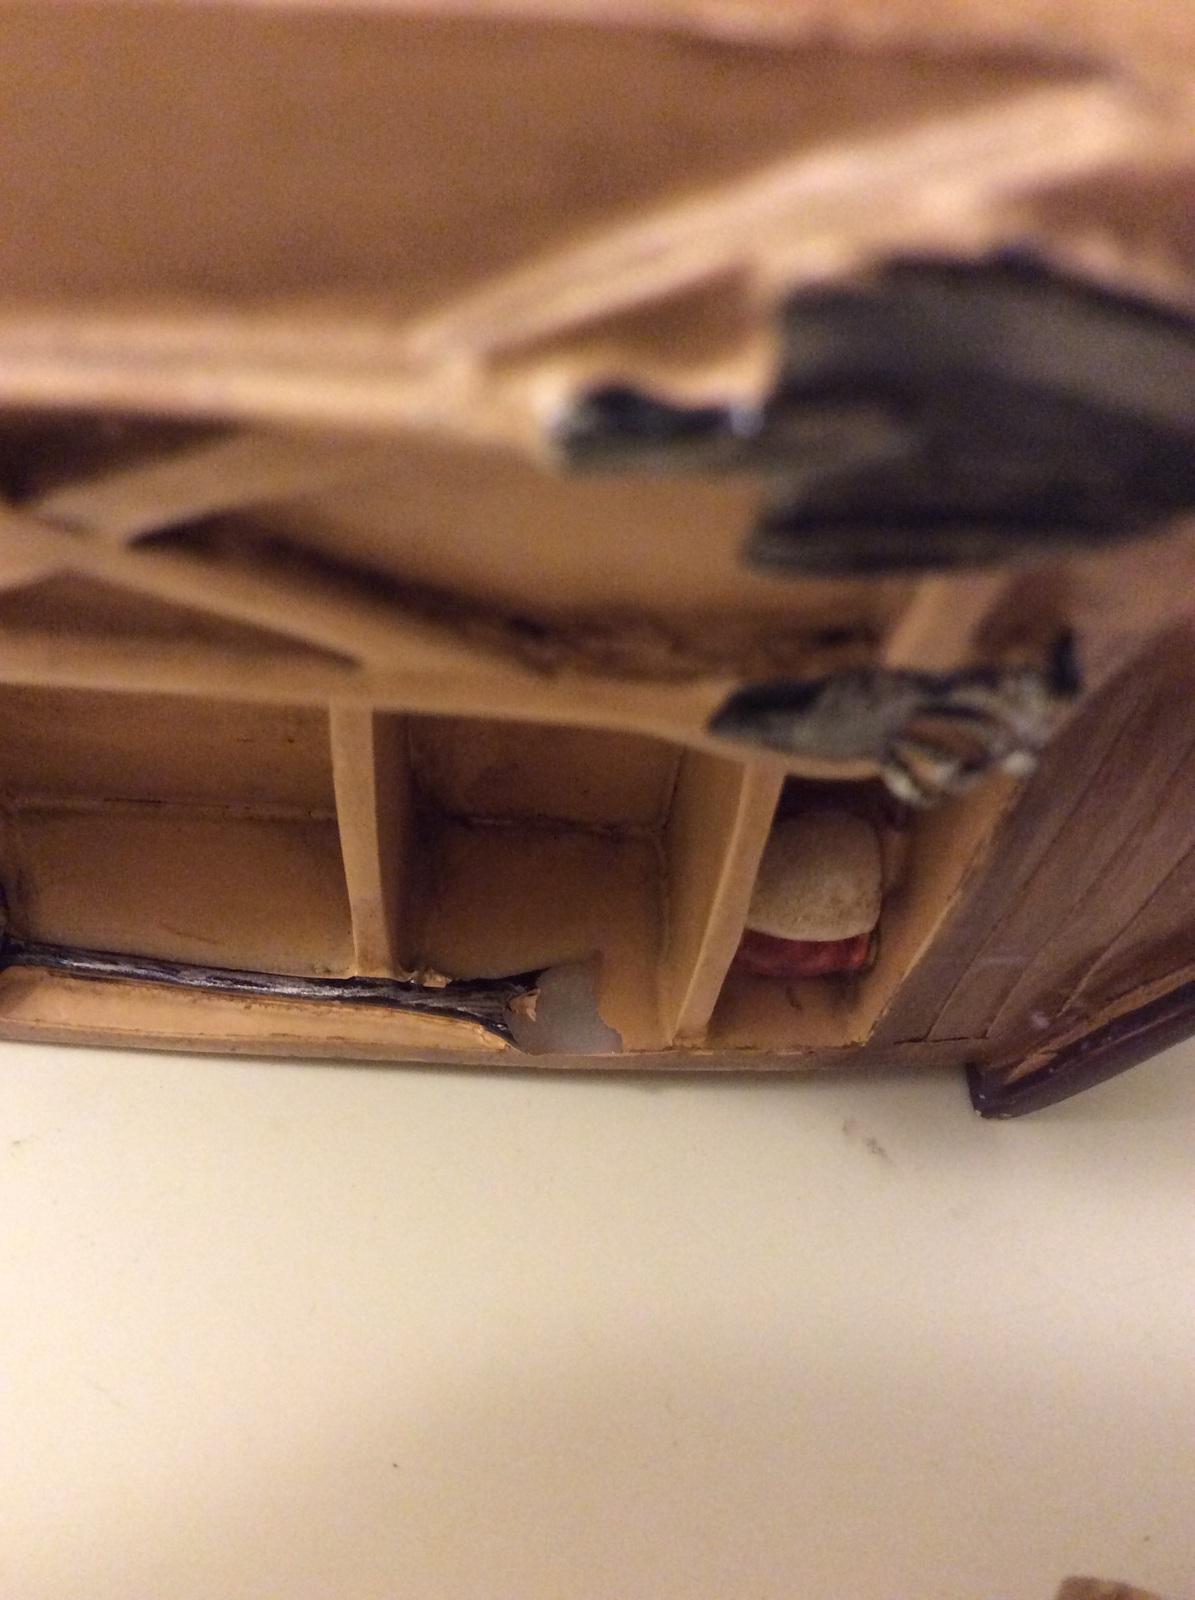 Lot of 3 Miniature Dollhouse Resins Furniture- Garden Shed, Wheelbarrow, Table